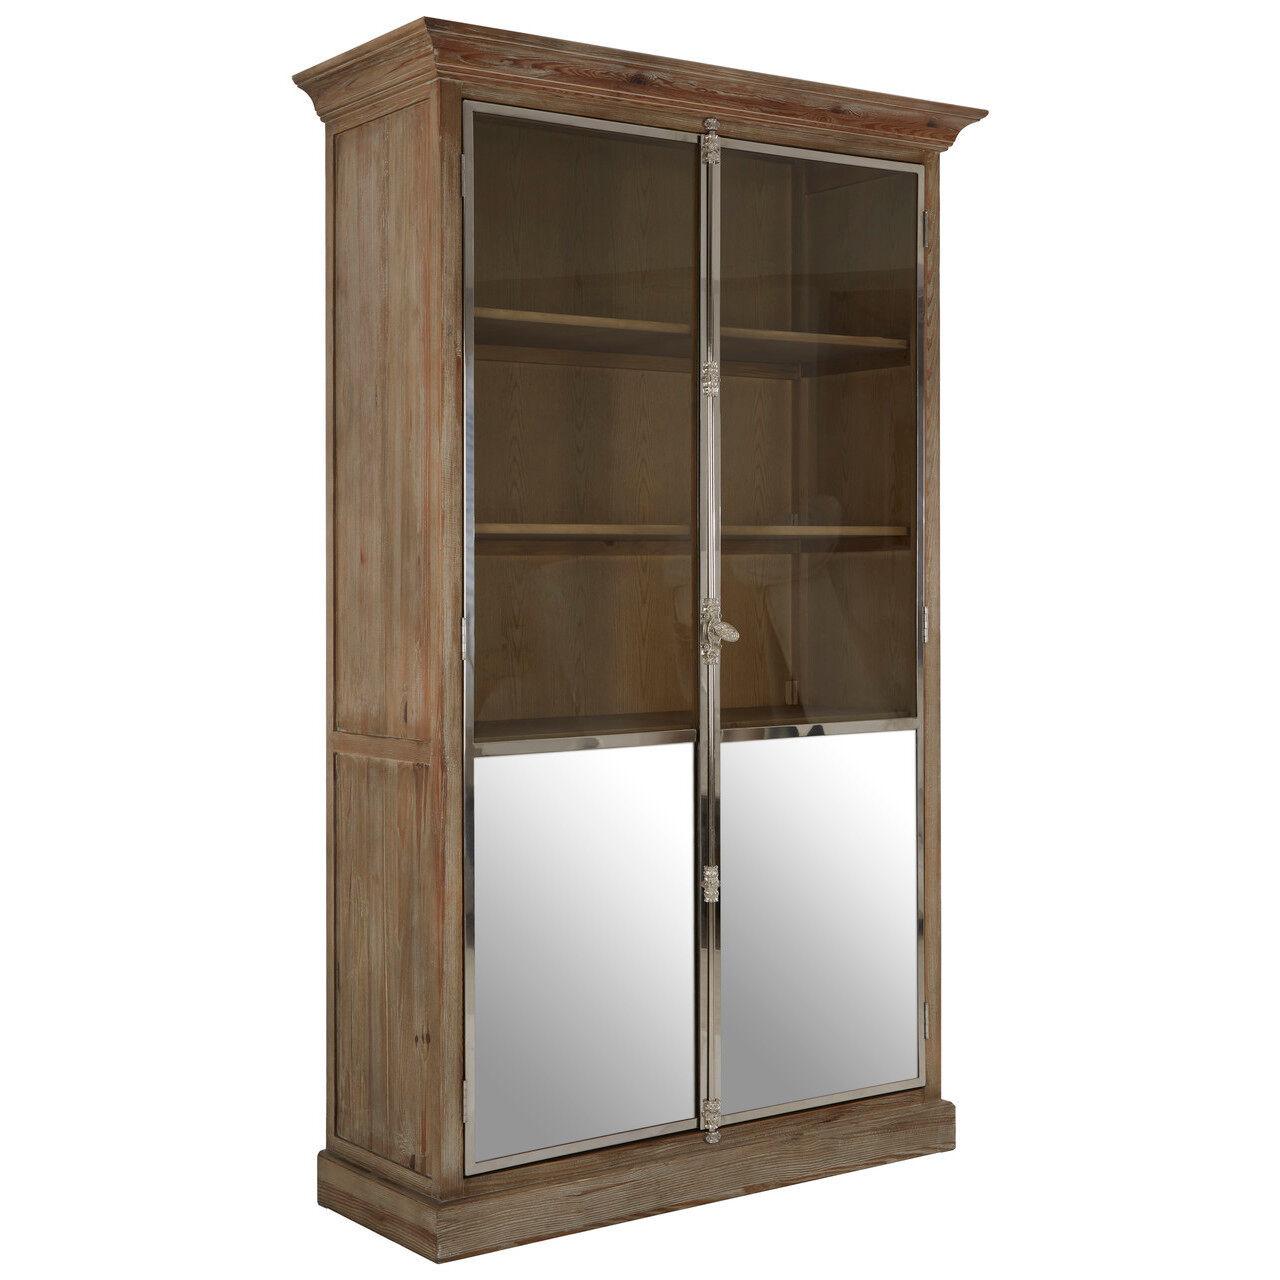 Plymouth 2 Door Cabinet   Whitewash Pine Wood   Glass